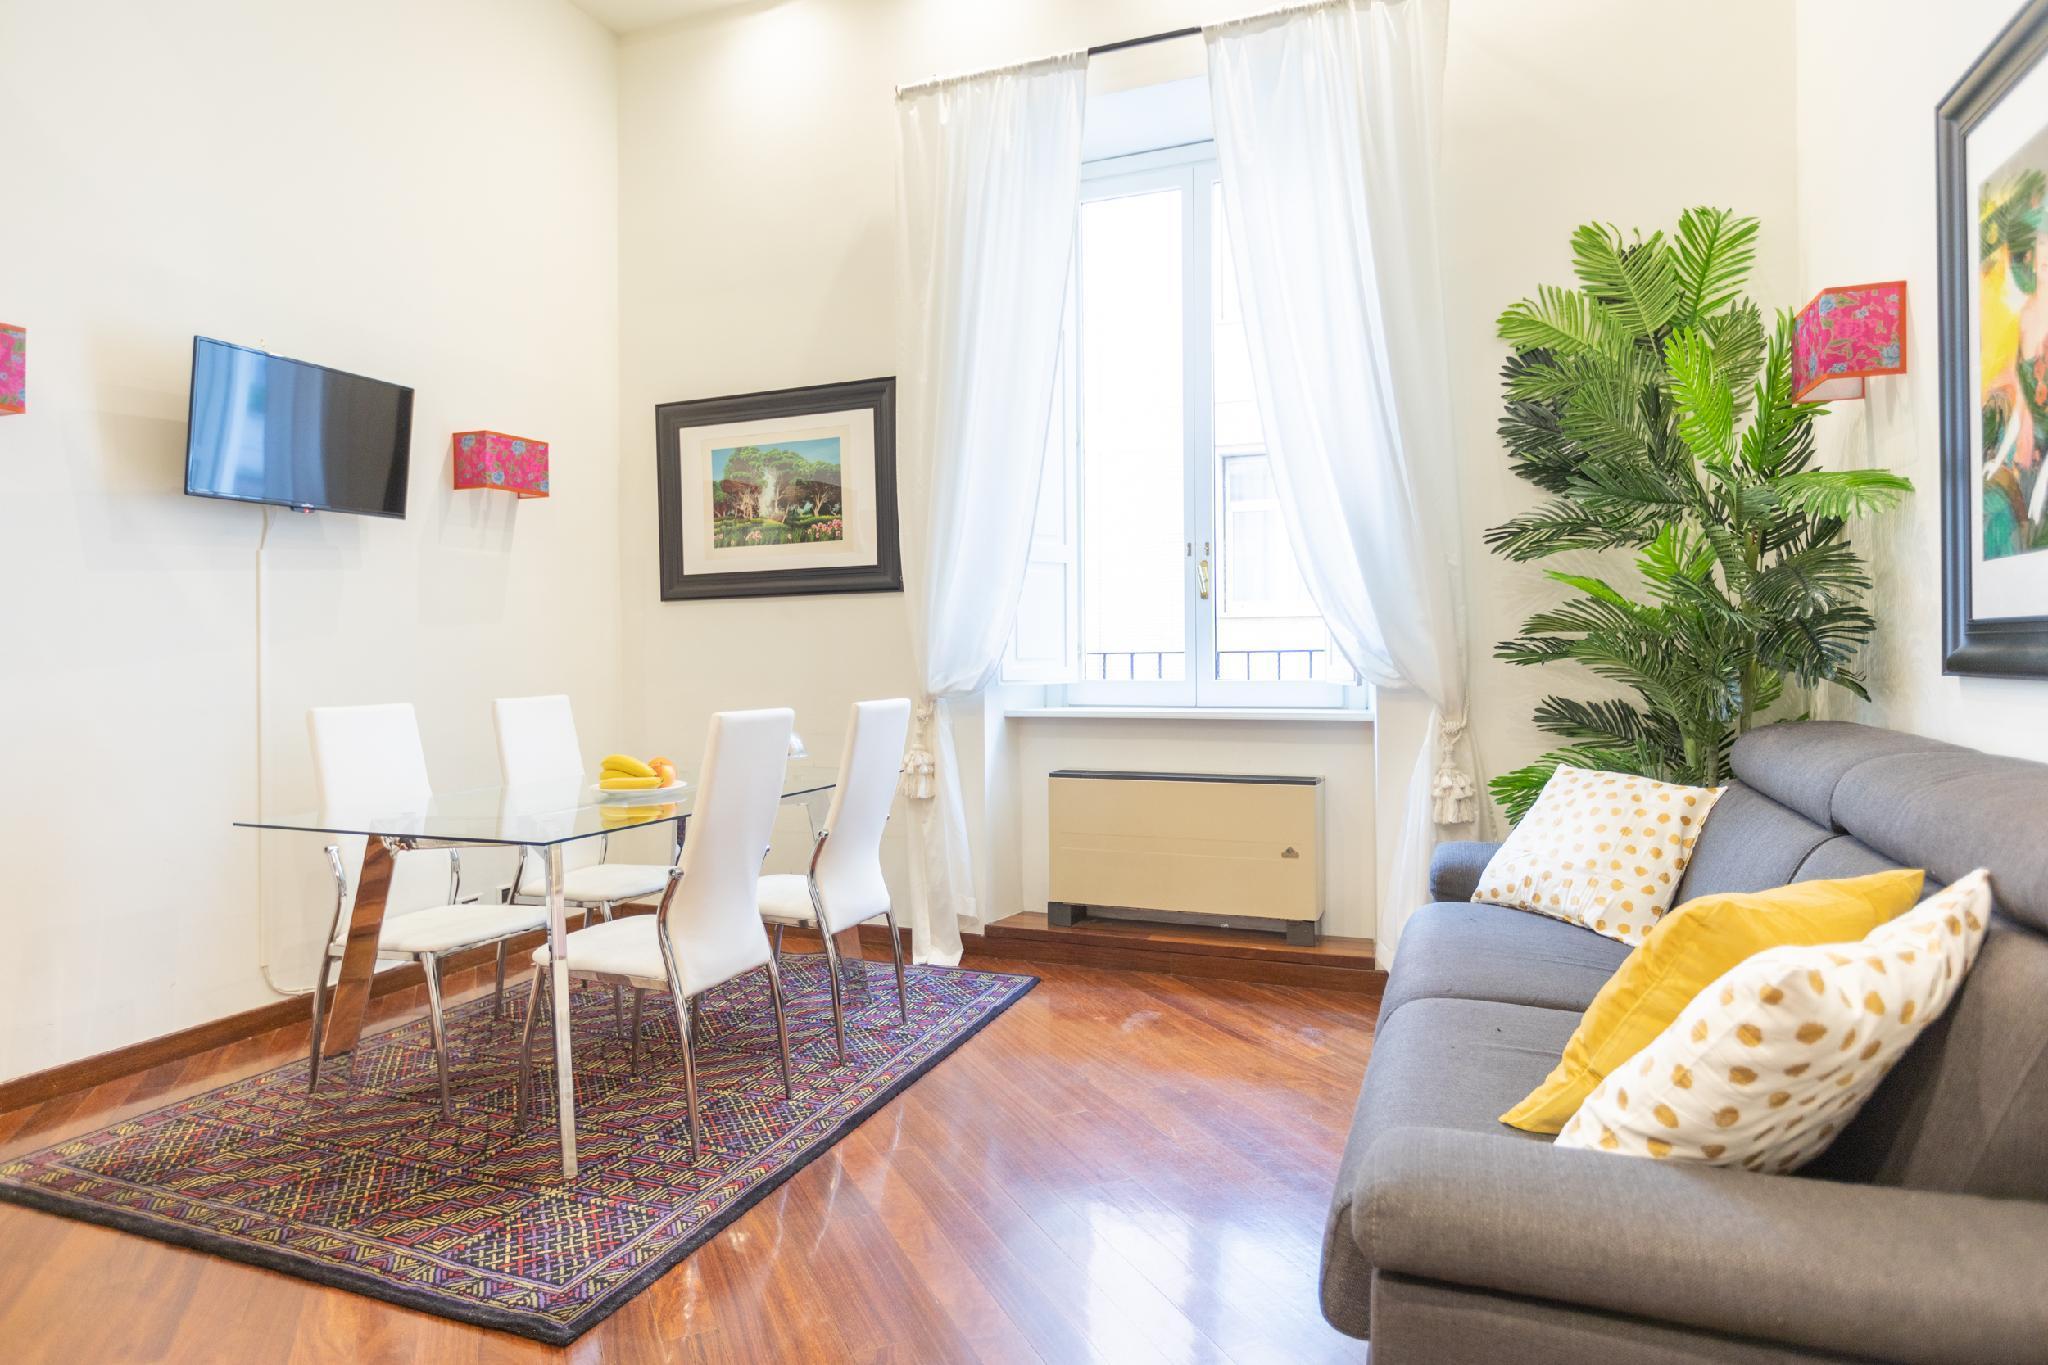 Barberini Luxury Apartment - Heart of Rome